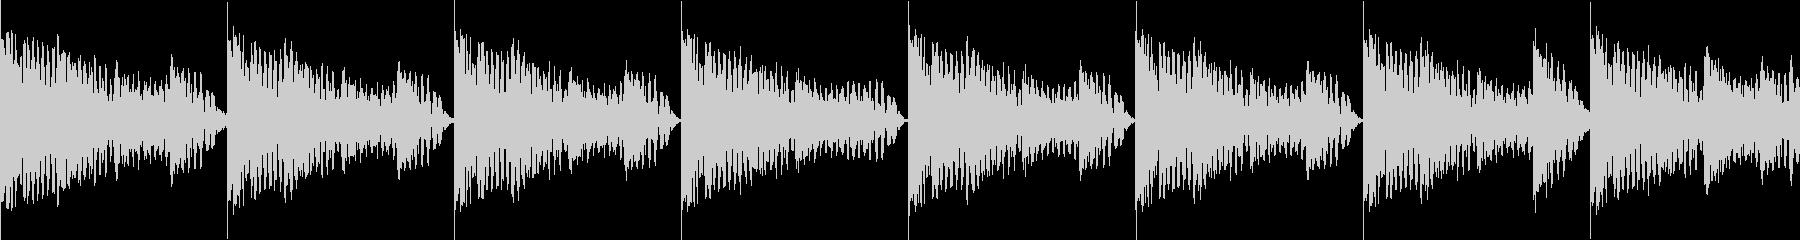 BPM128EDMリズムループ キーFの未再生の波形